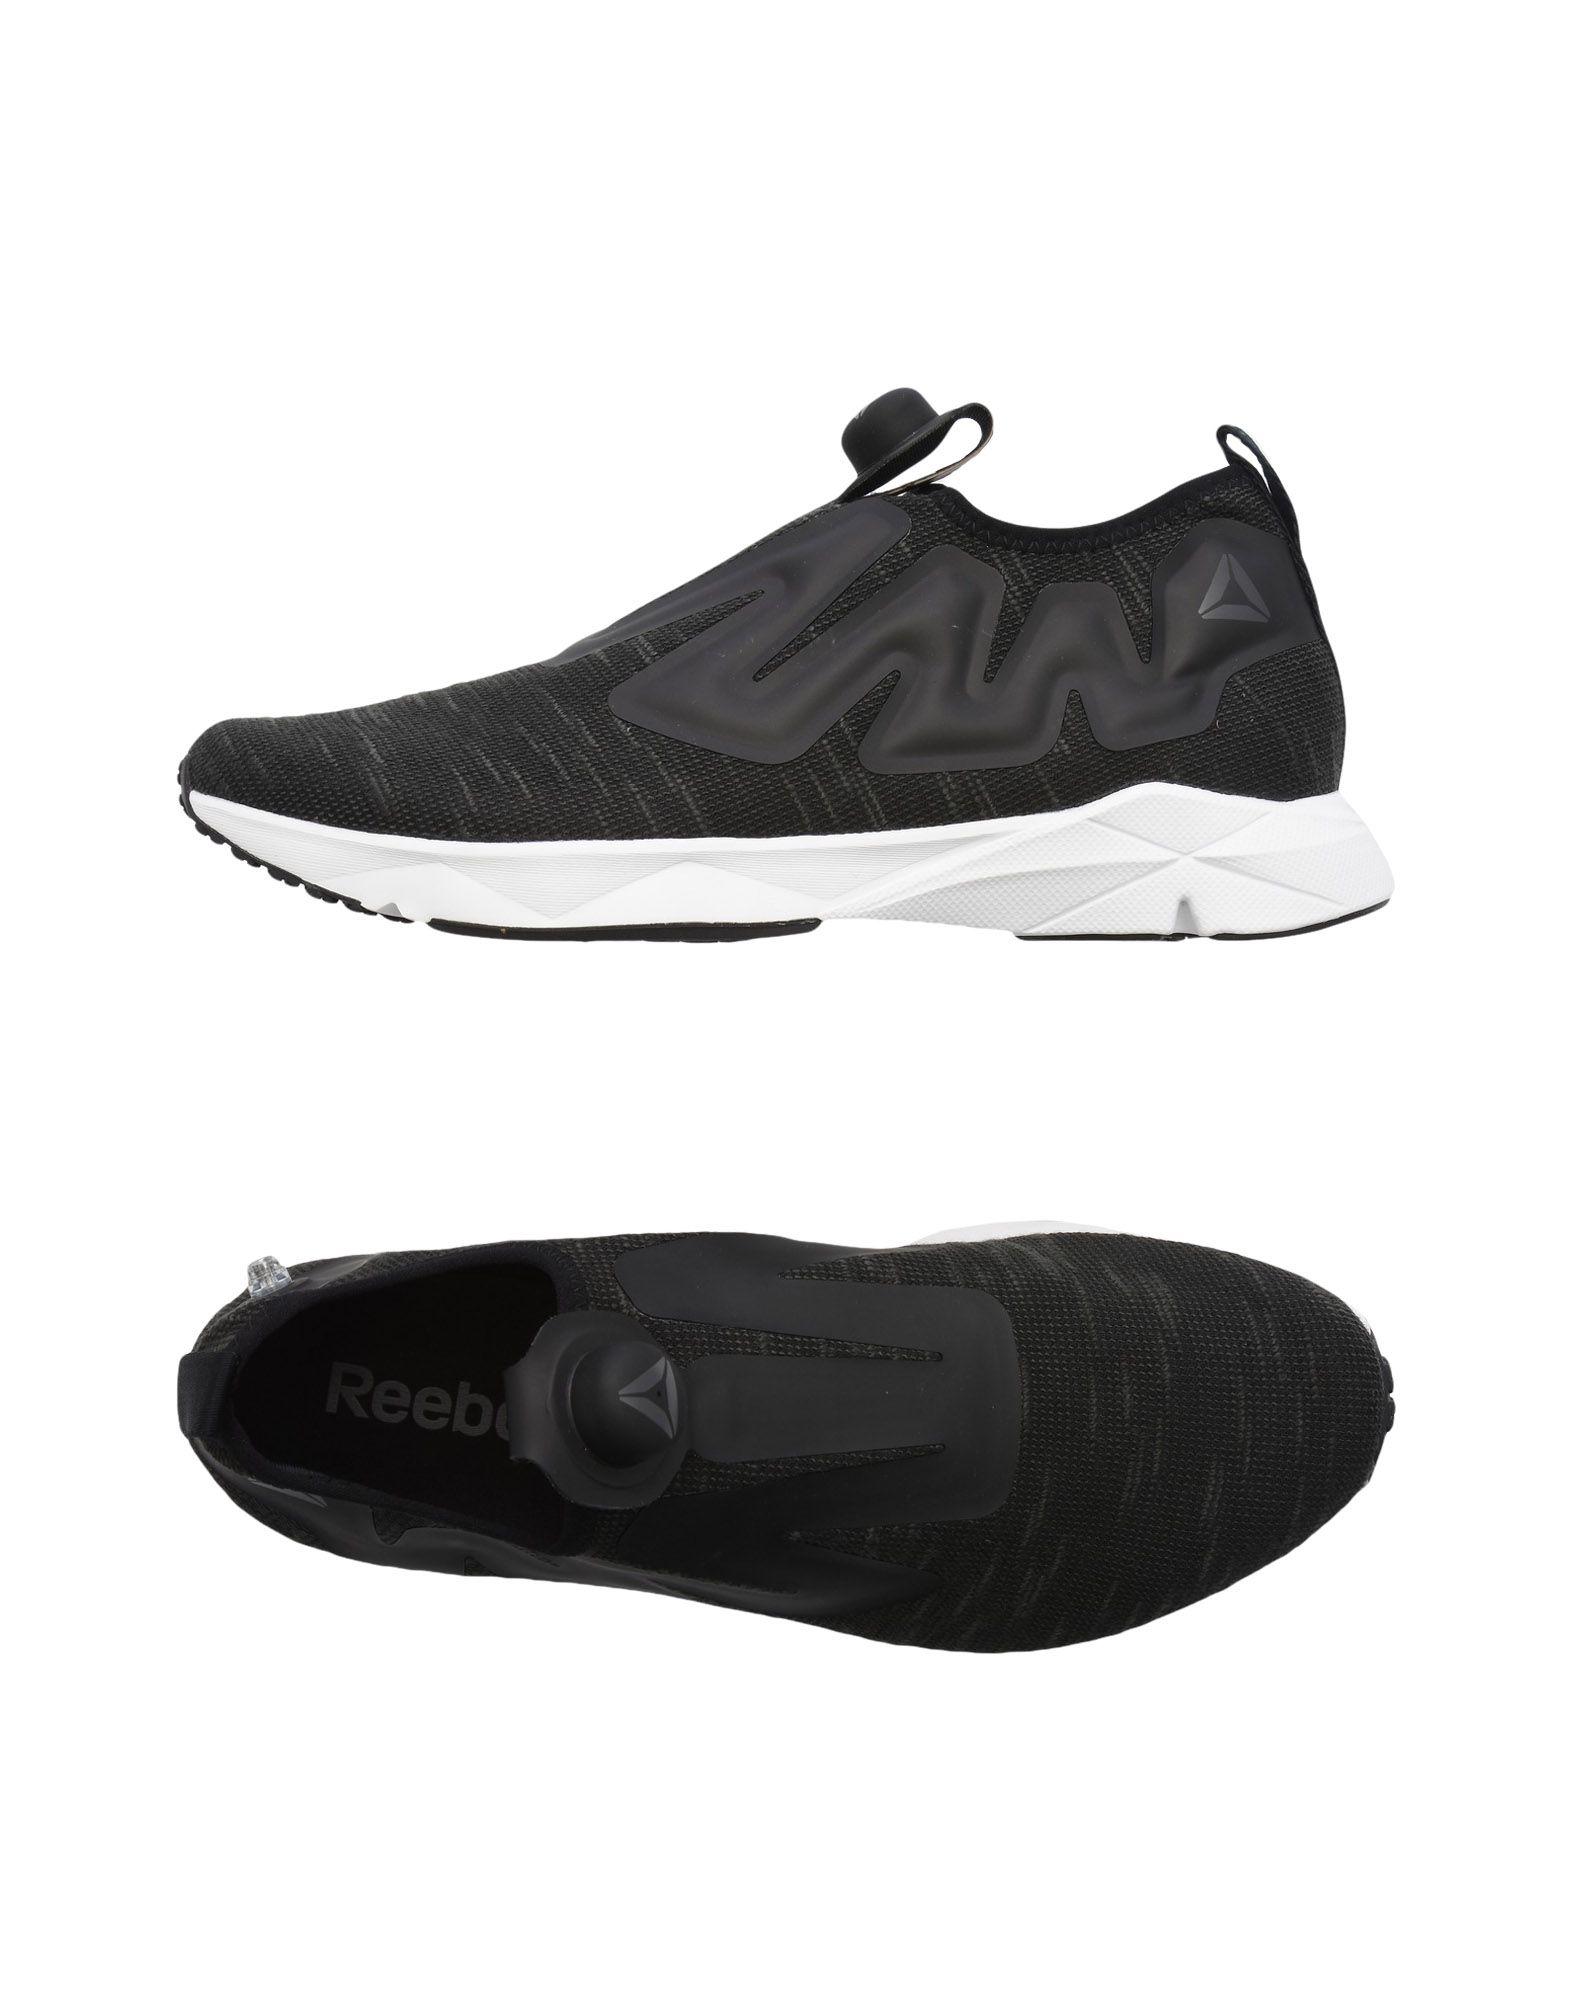 Rabatt echte Supreme Schuhe Reebok Reebok Pump Supreme echte  11458281XD 4dc4a7